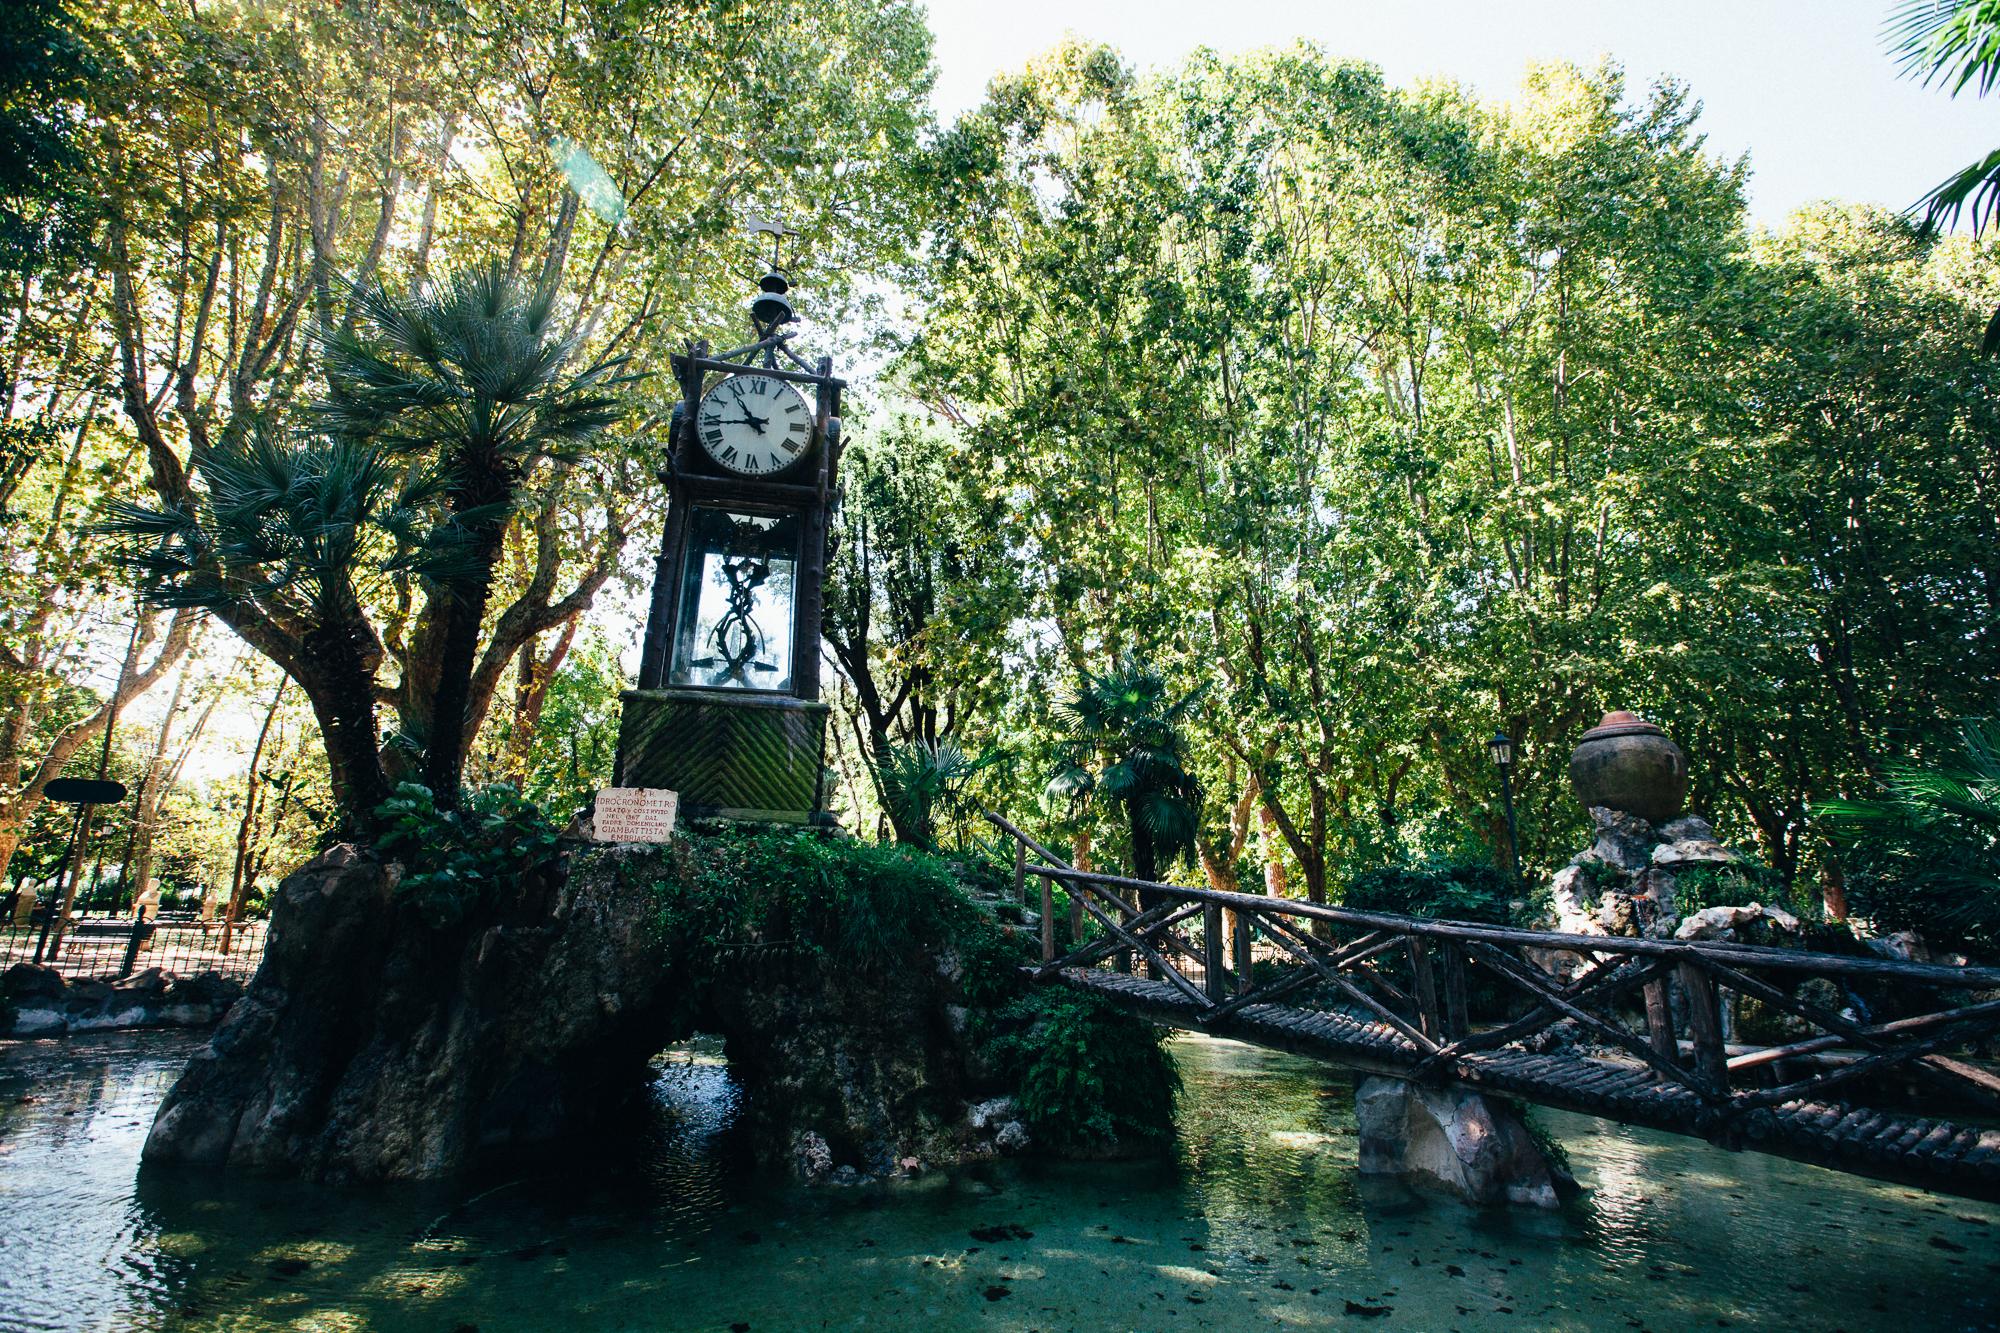 idrocronometro (water clock), villa borghese gardens, rome. by leonie wise